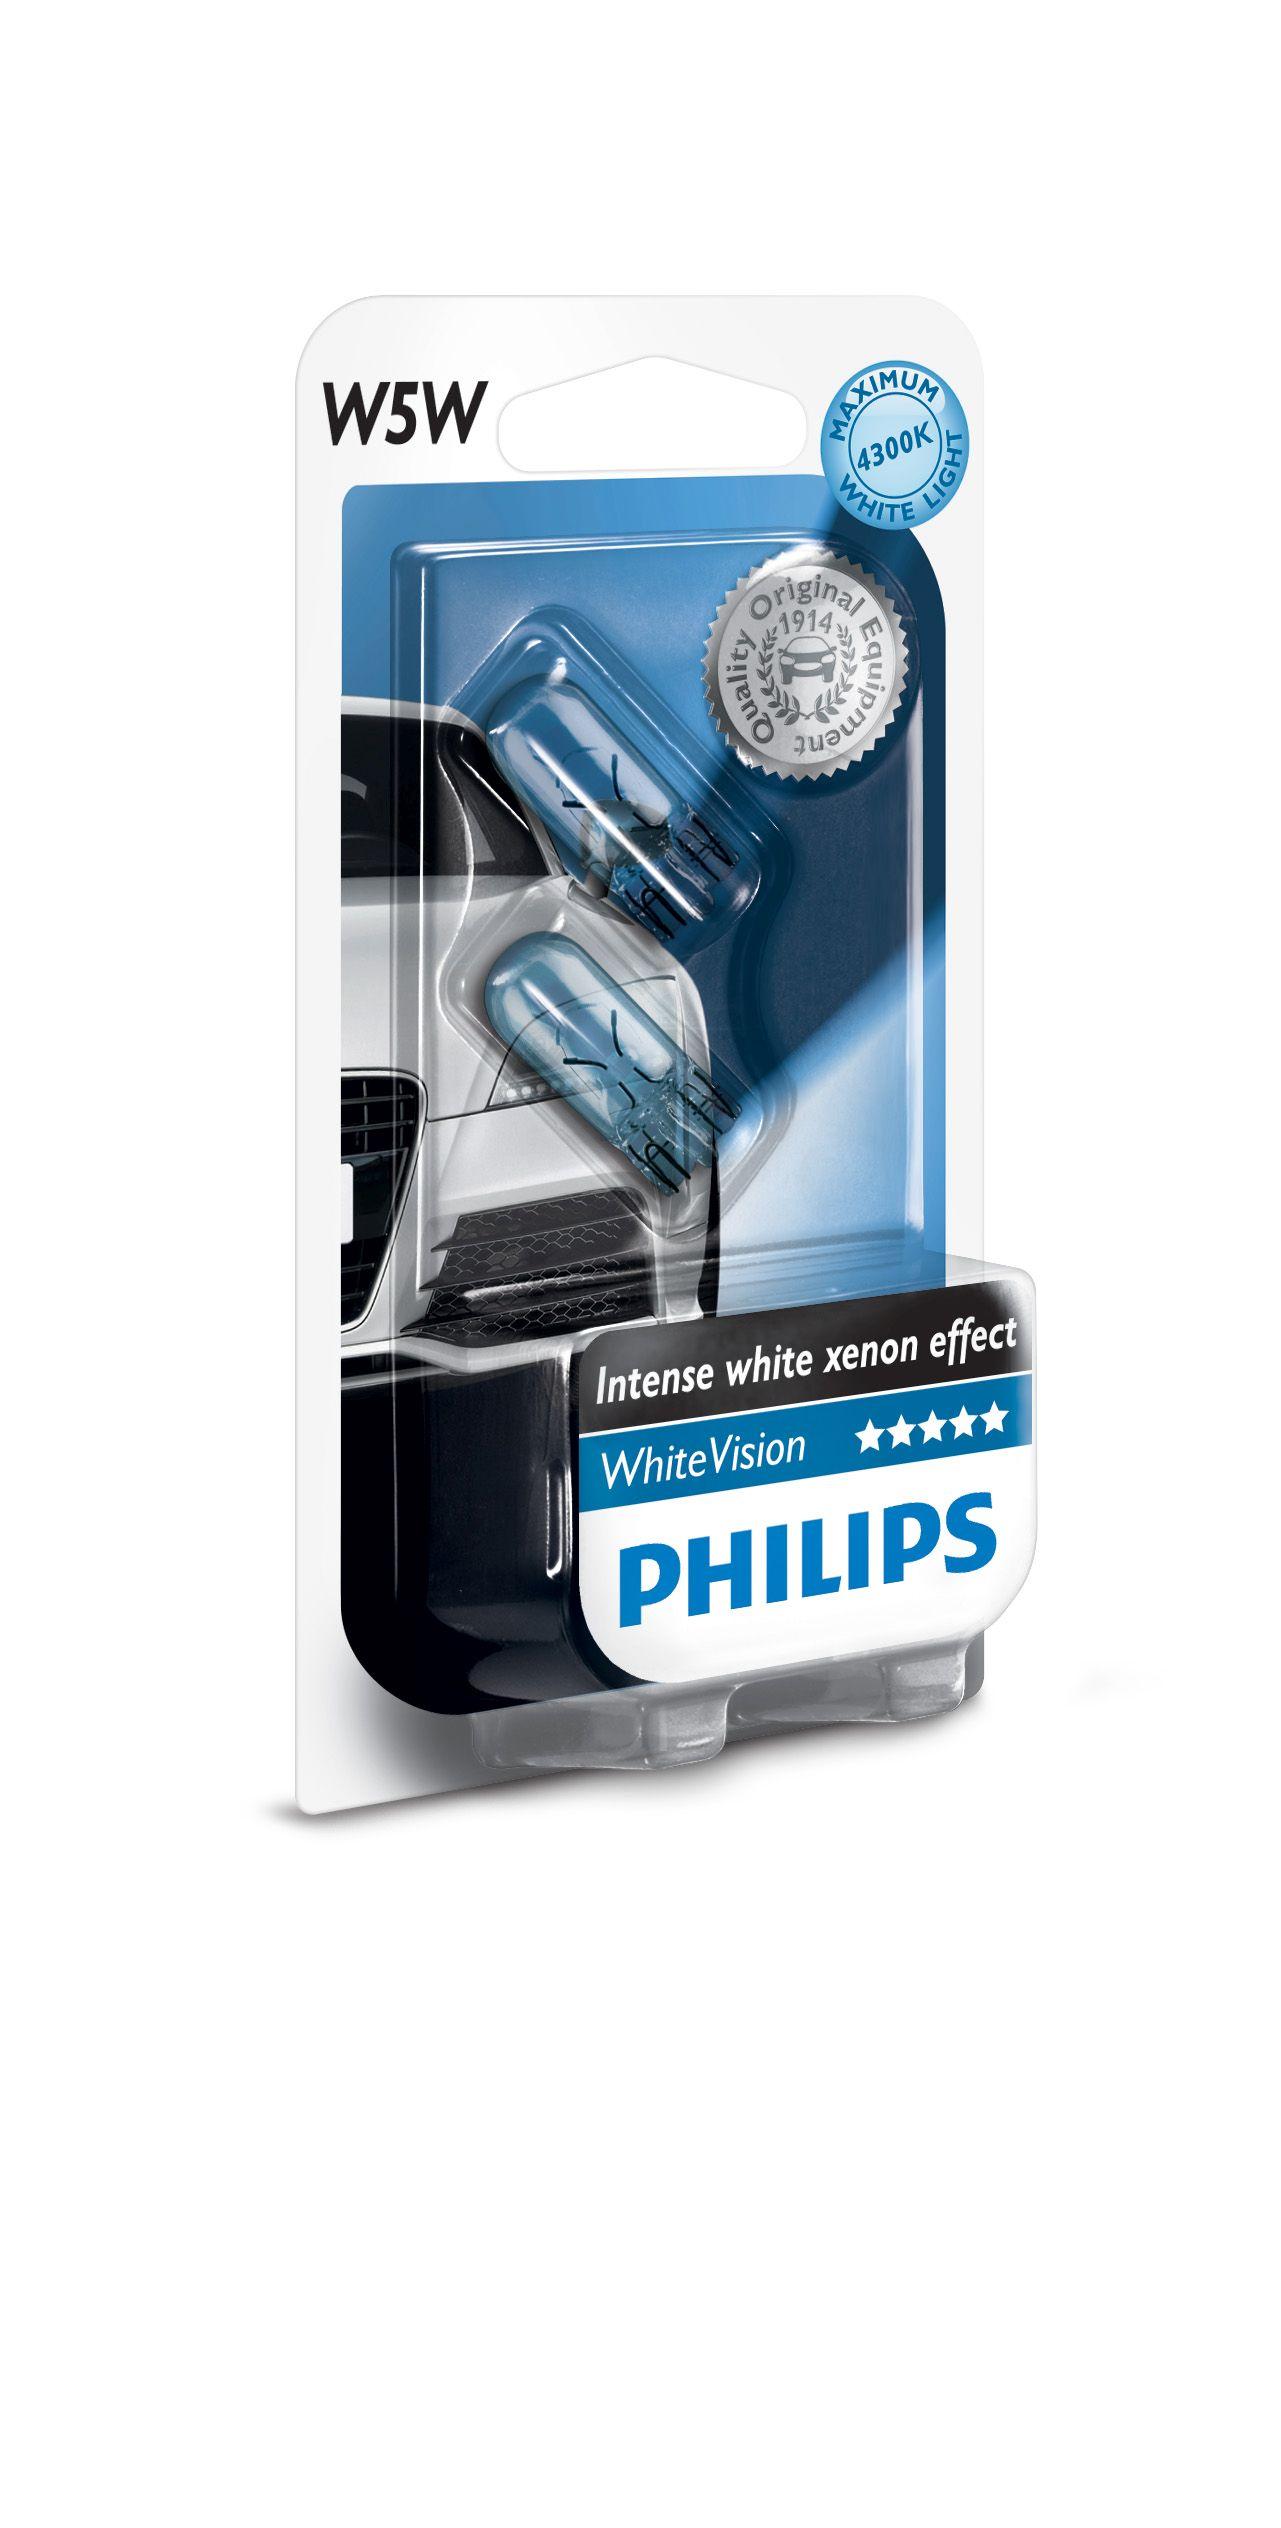 philips w5w whitevision intense halogen lampe 12961nbvb2 online g nstig kaufen. Black Bedroom Furniture Sets. Home Design Ideas